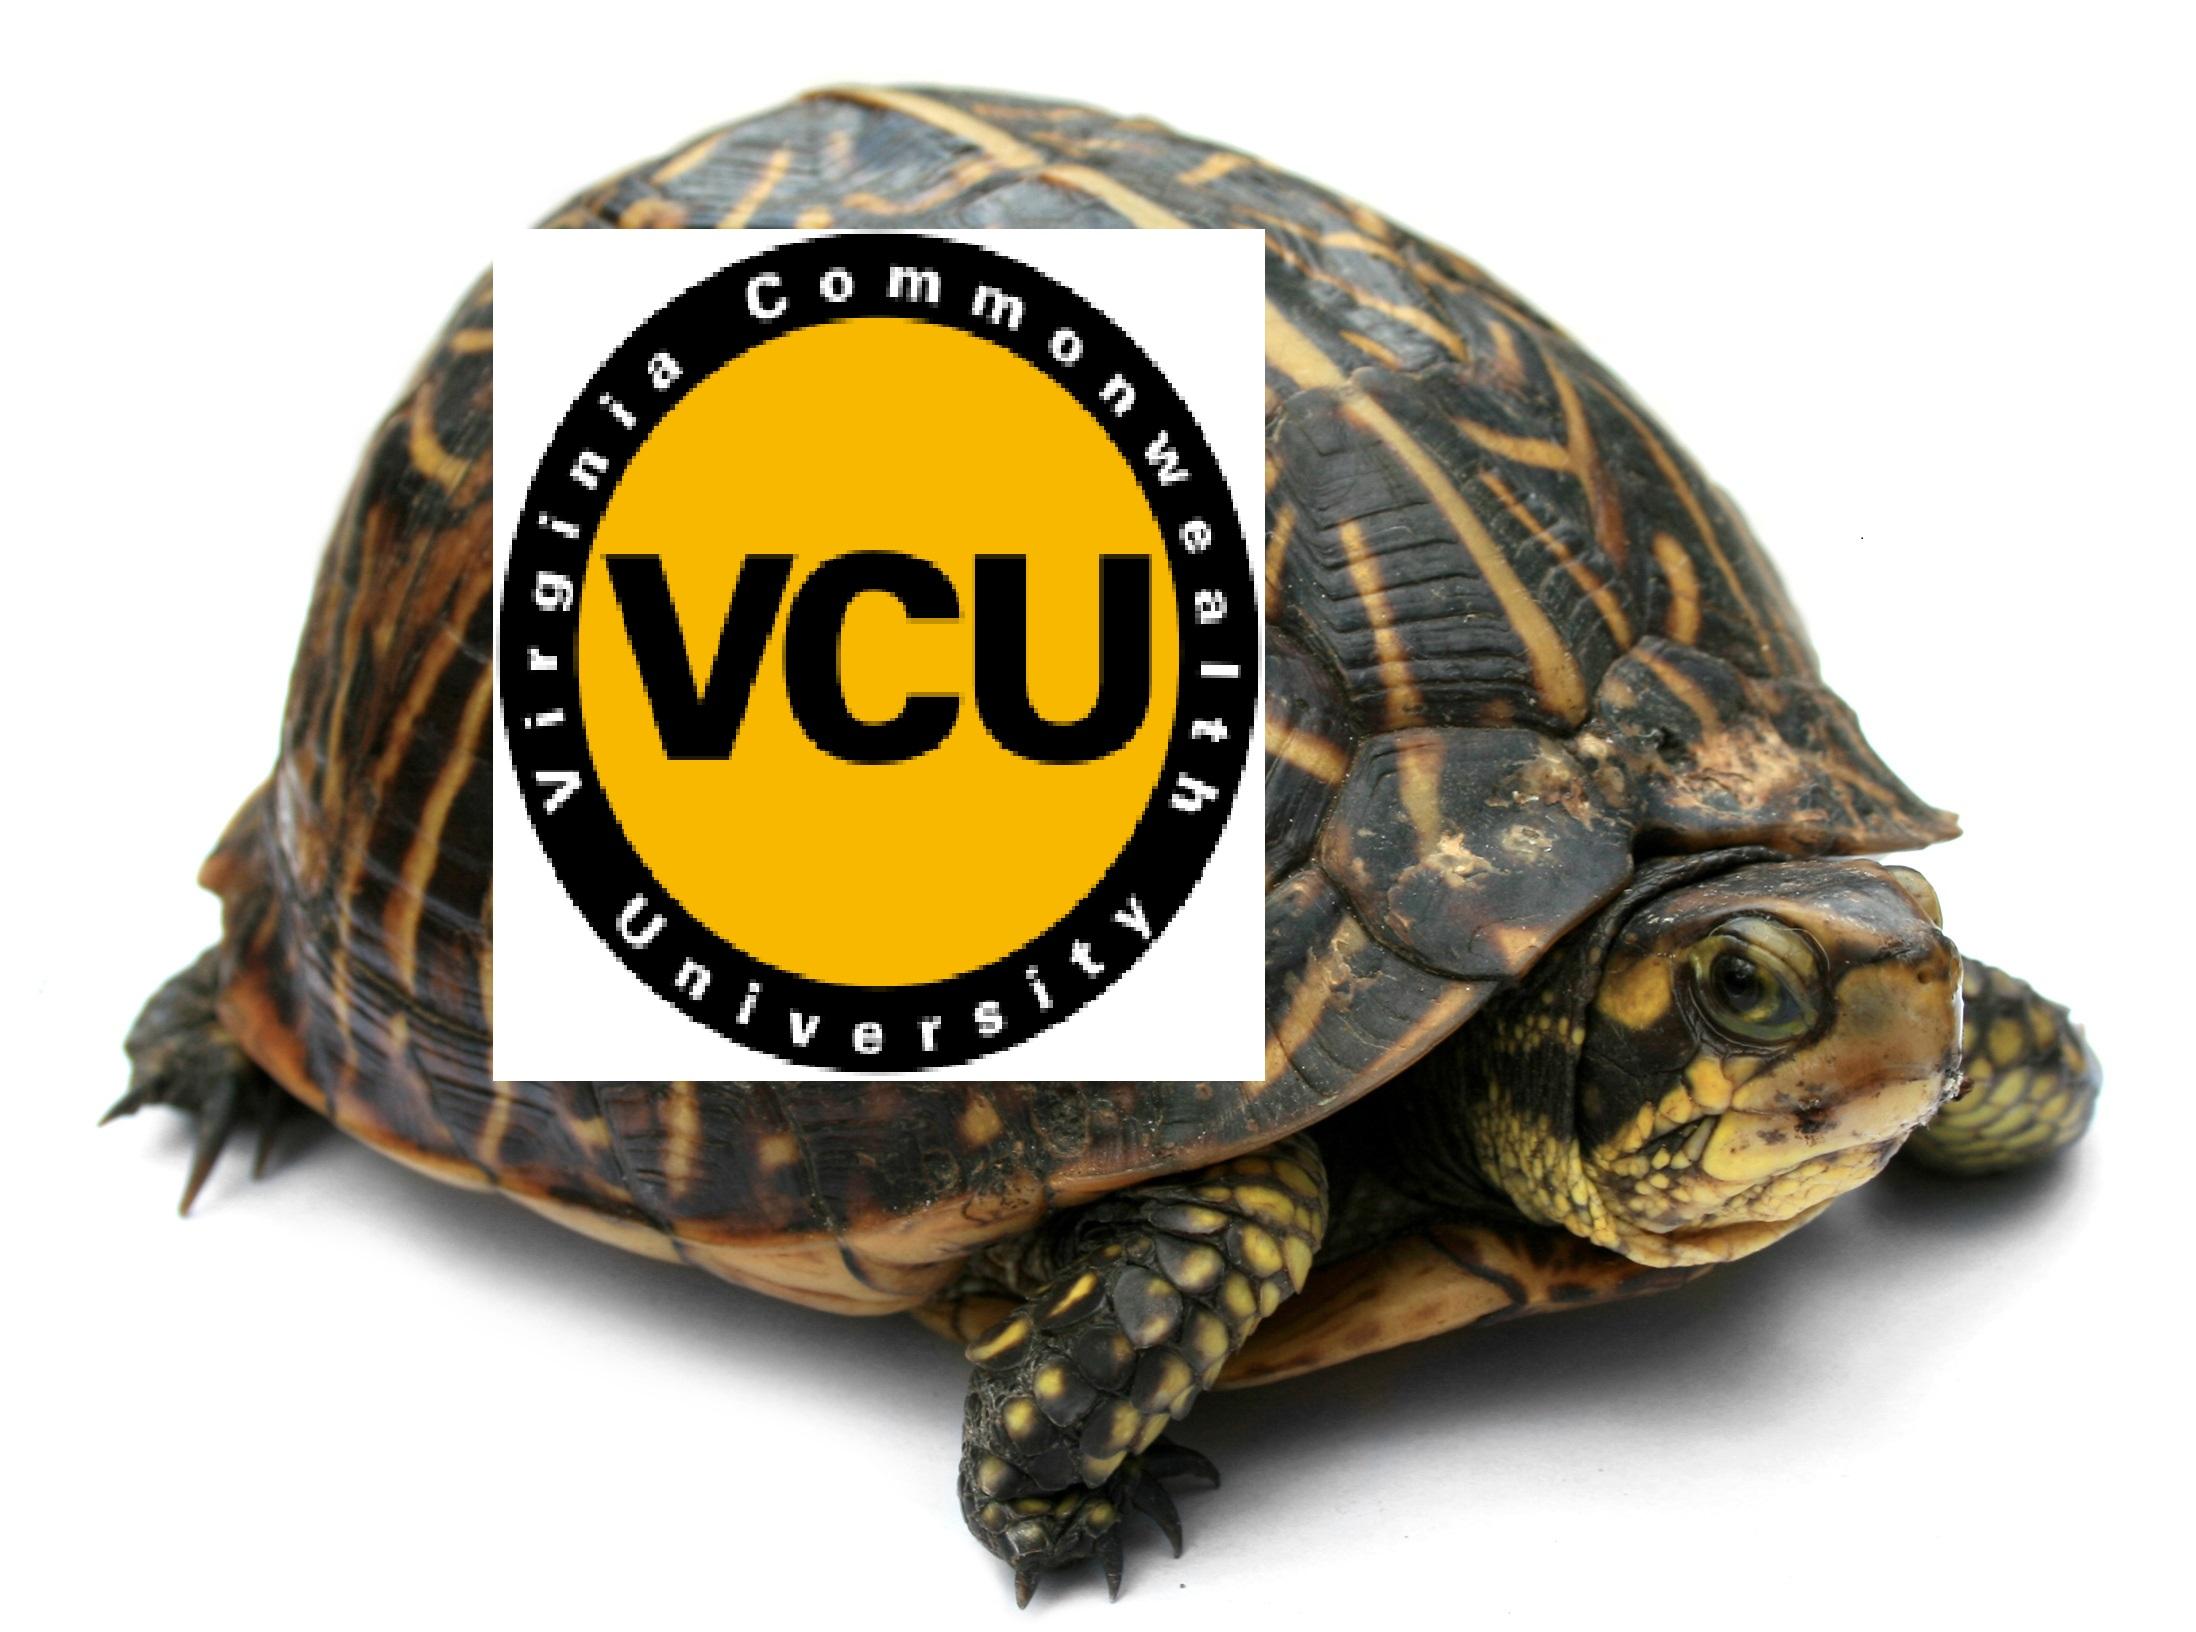 virginia commonwealth university application status